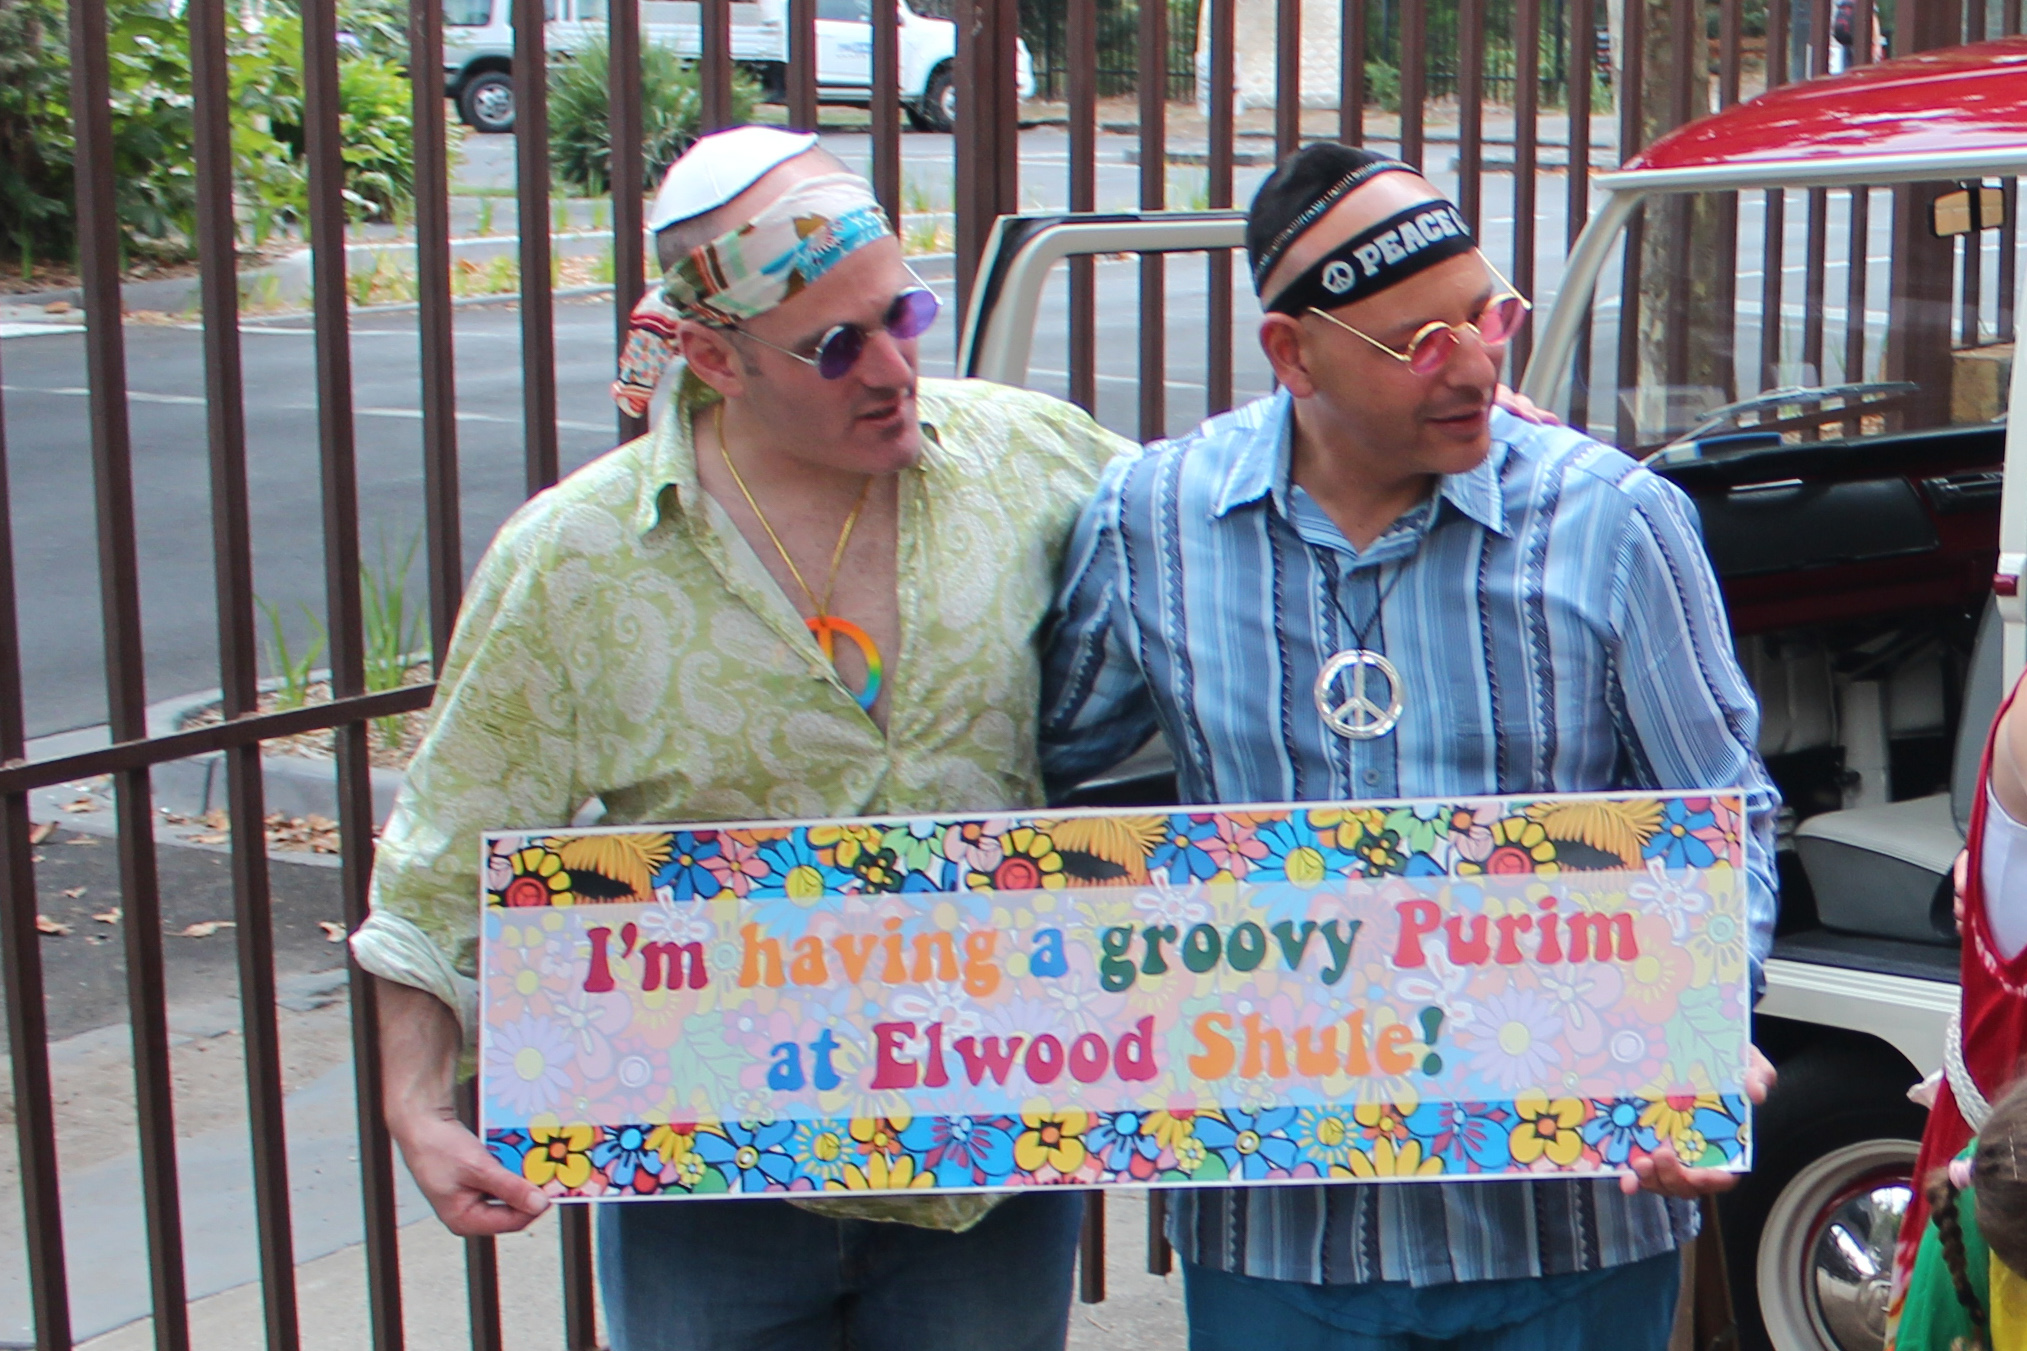 Elwood Shule 60's Photobooth (55)